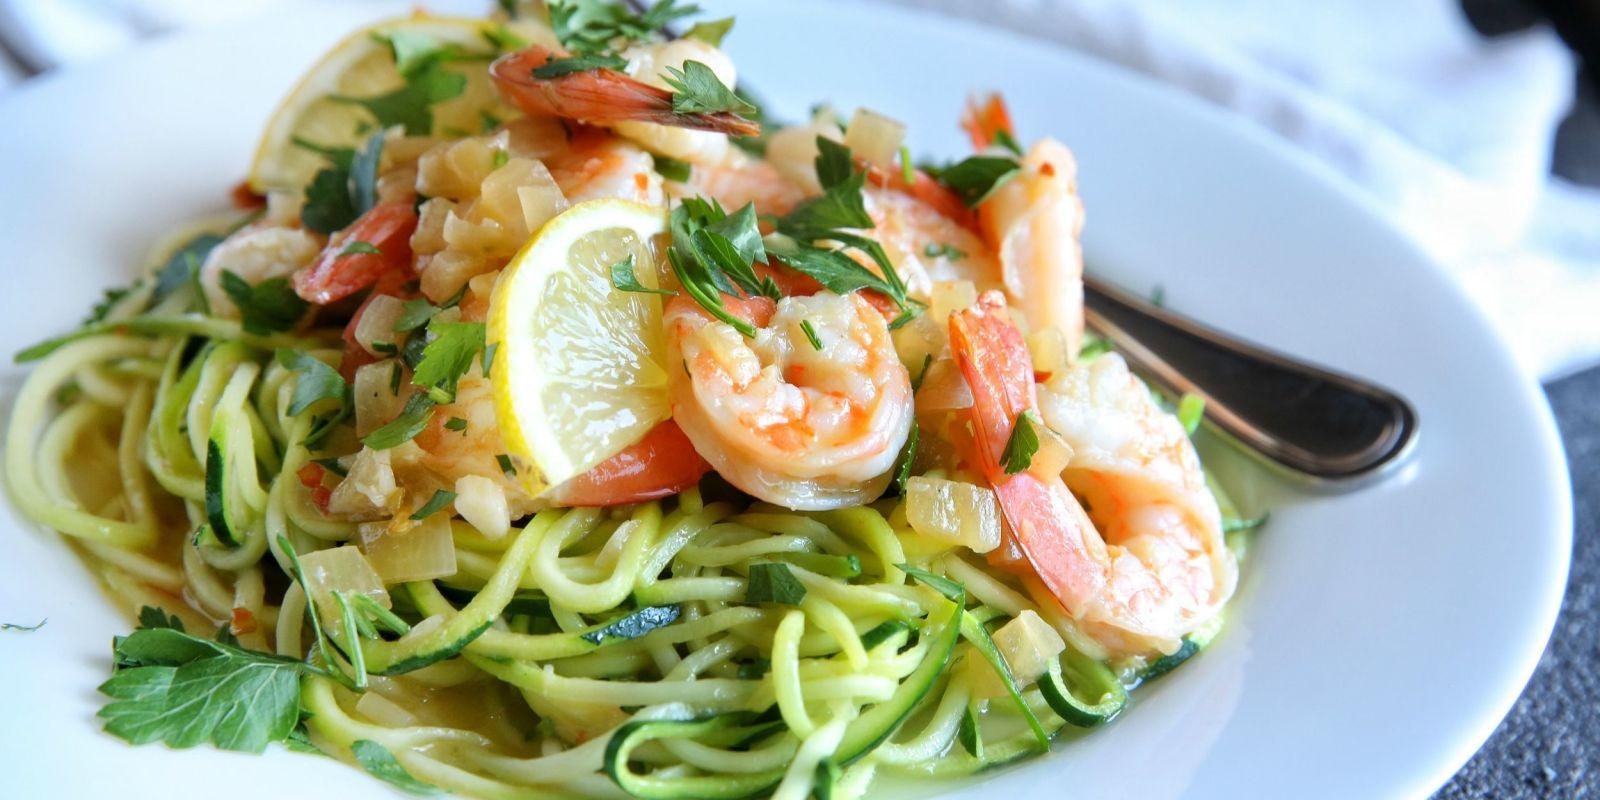 Simple Summer Dinners Recipes  100 Easy Summer Dinner Recipes Best Ideas for Summer